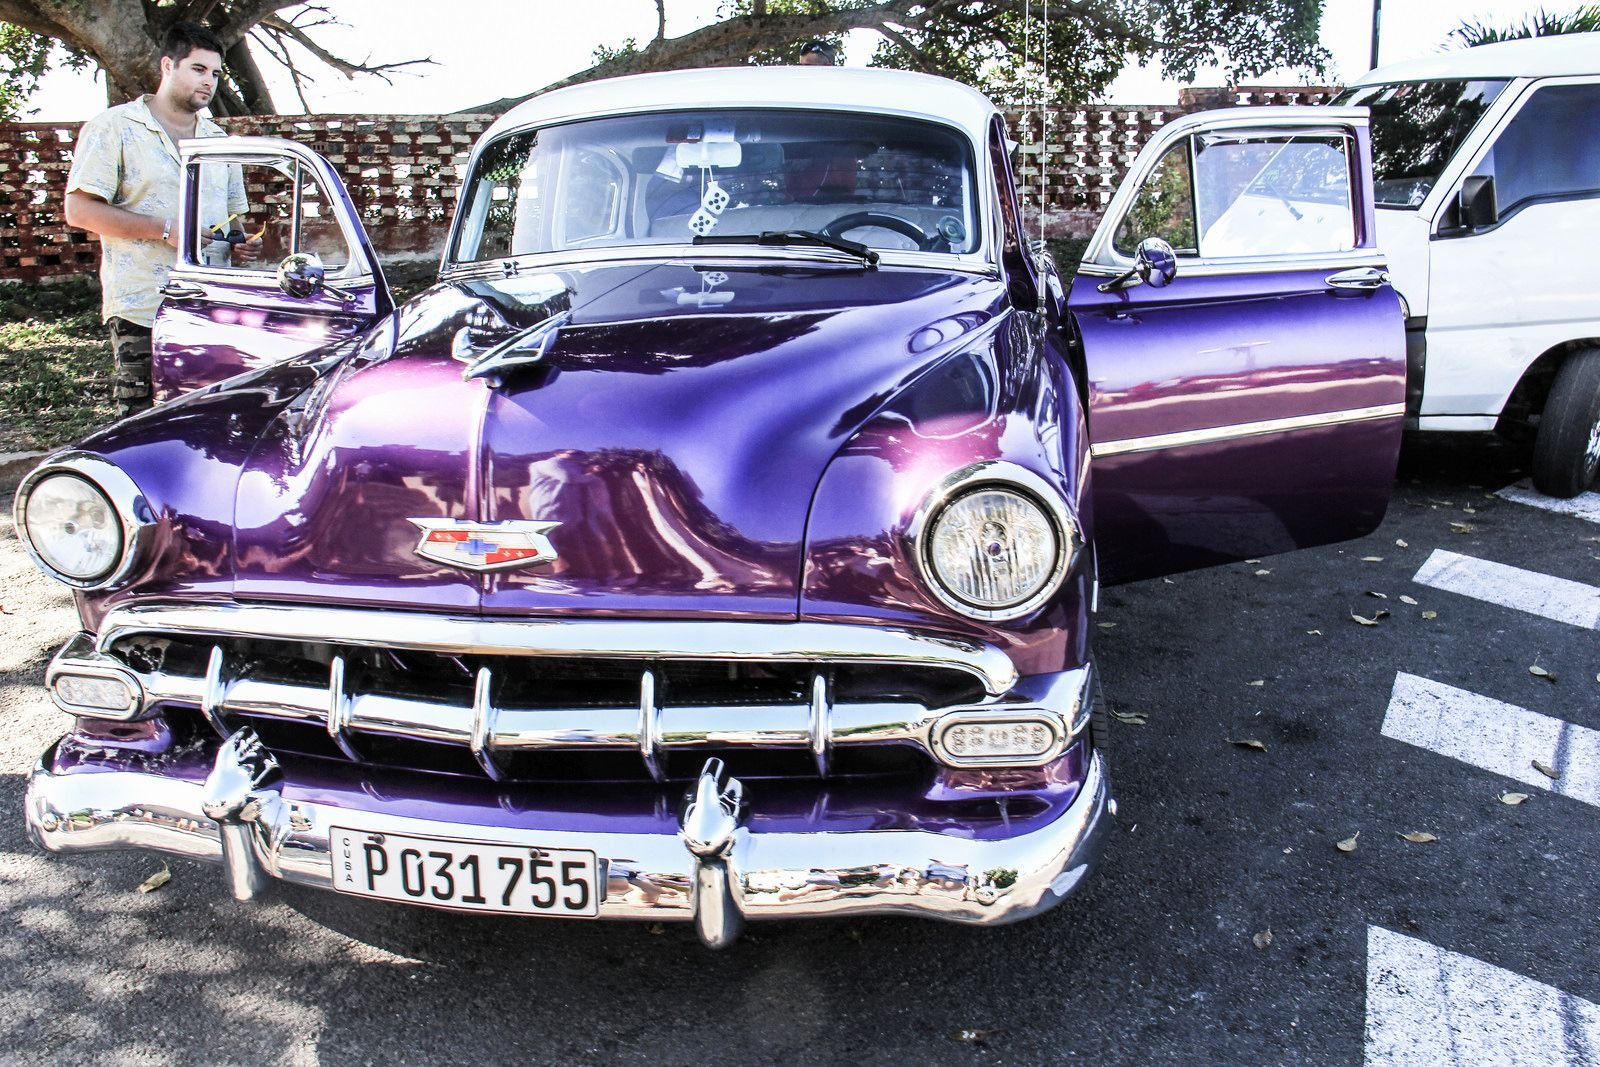 1954 Chevy Bel Air - Cuba | Bel air, Chevrolet and Cars